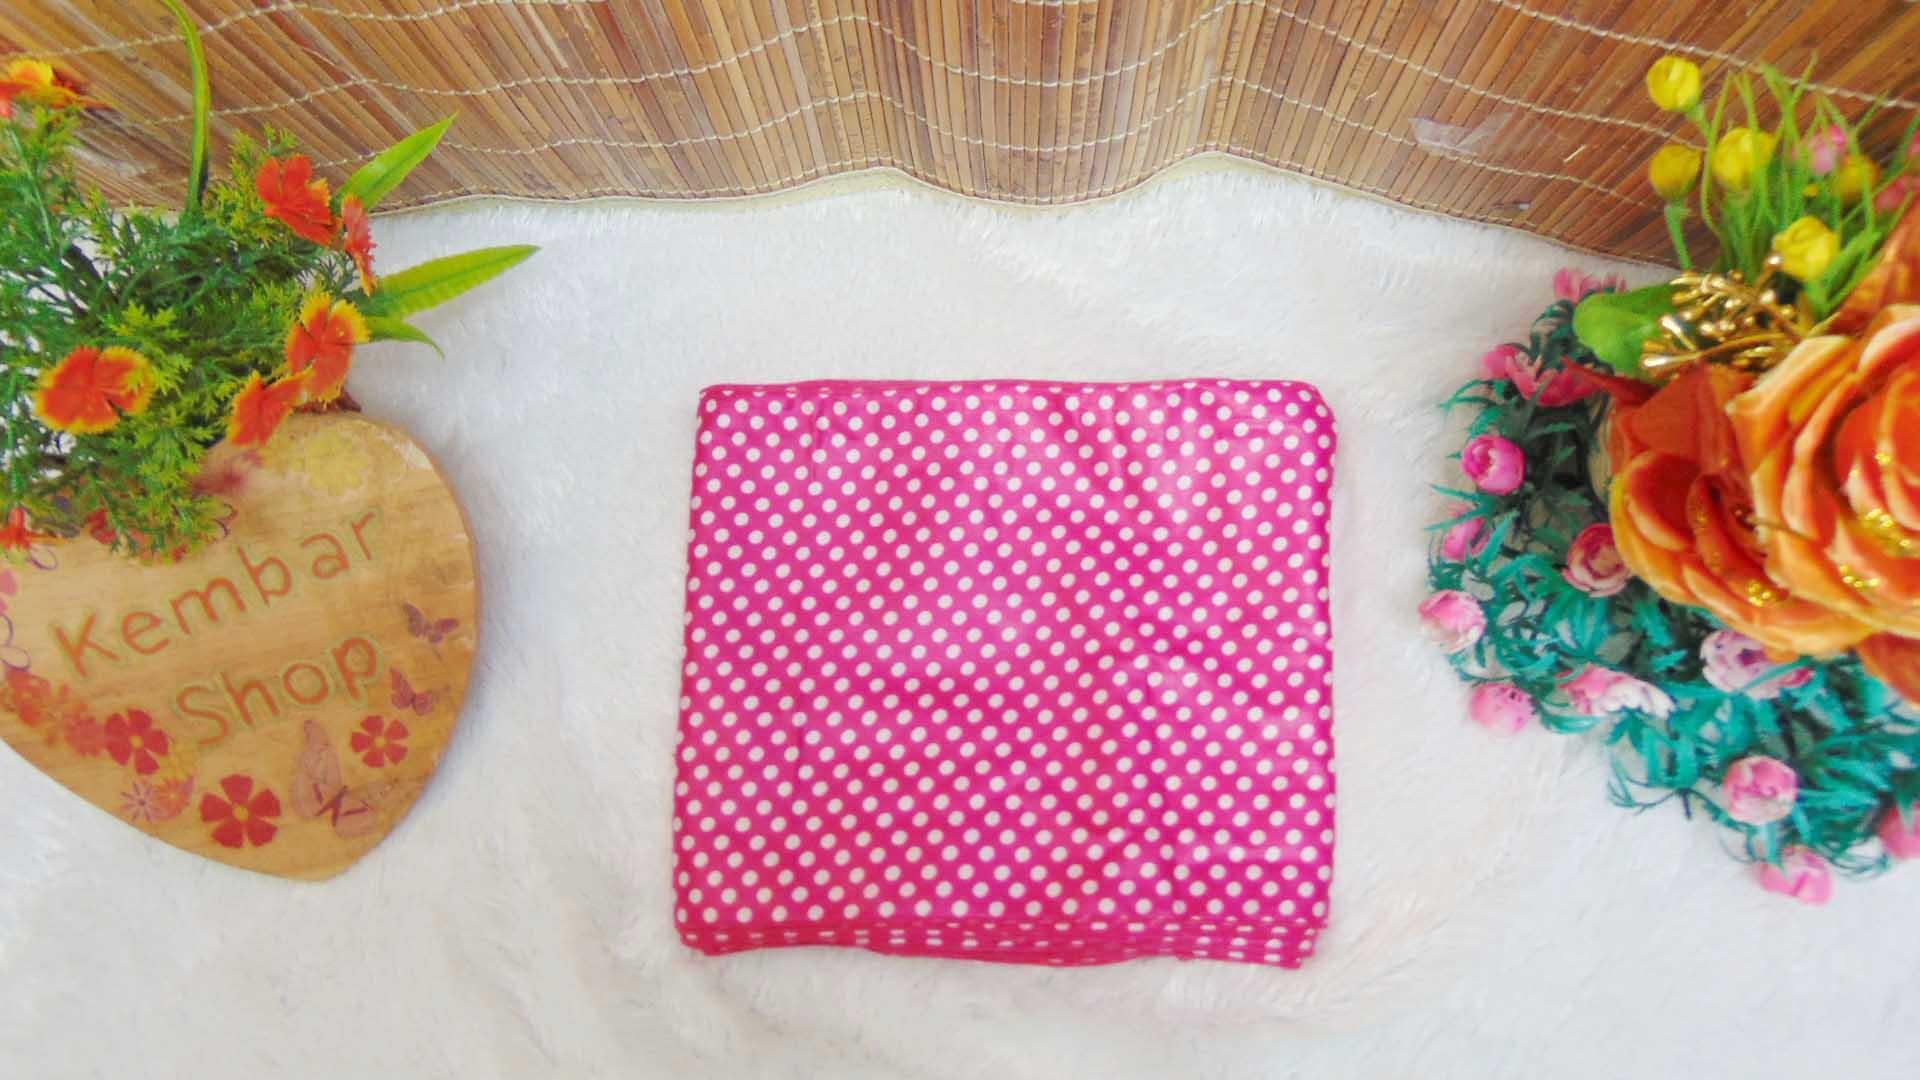 Bengkung modern 20meter bengkung santung bengkung belly binding bengkung andien motif polka ANEKA WARNA (5)